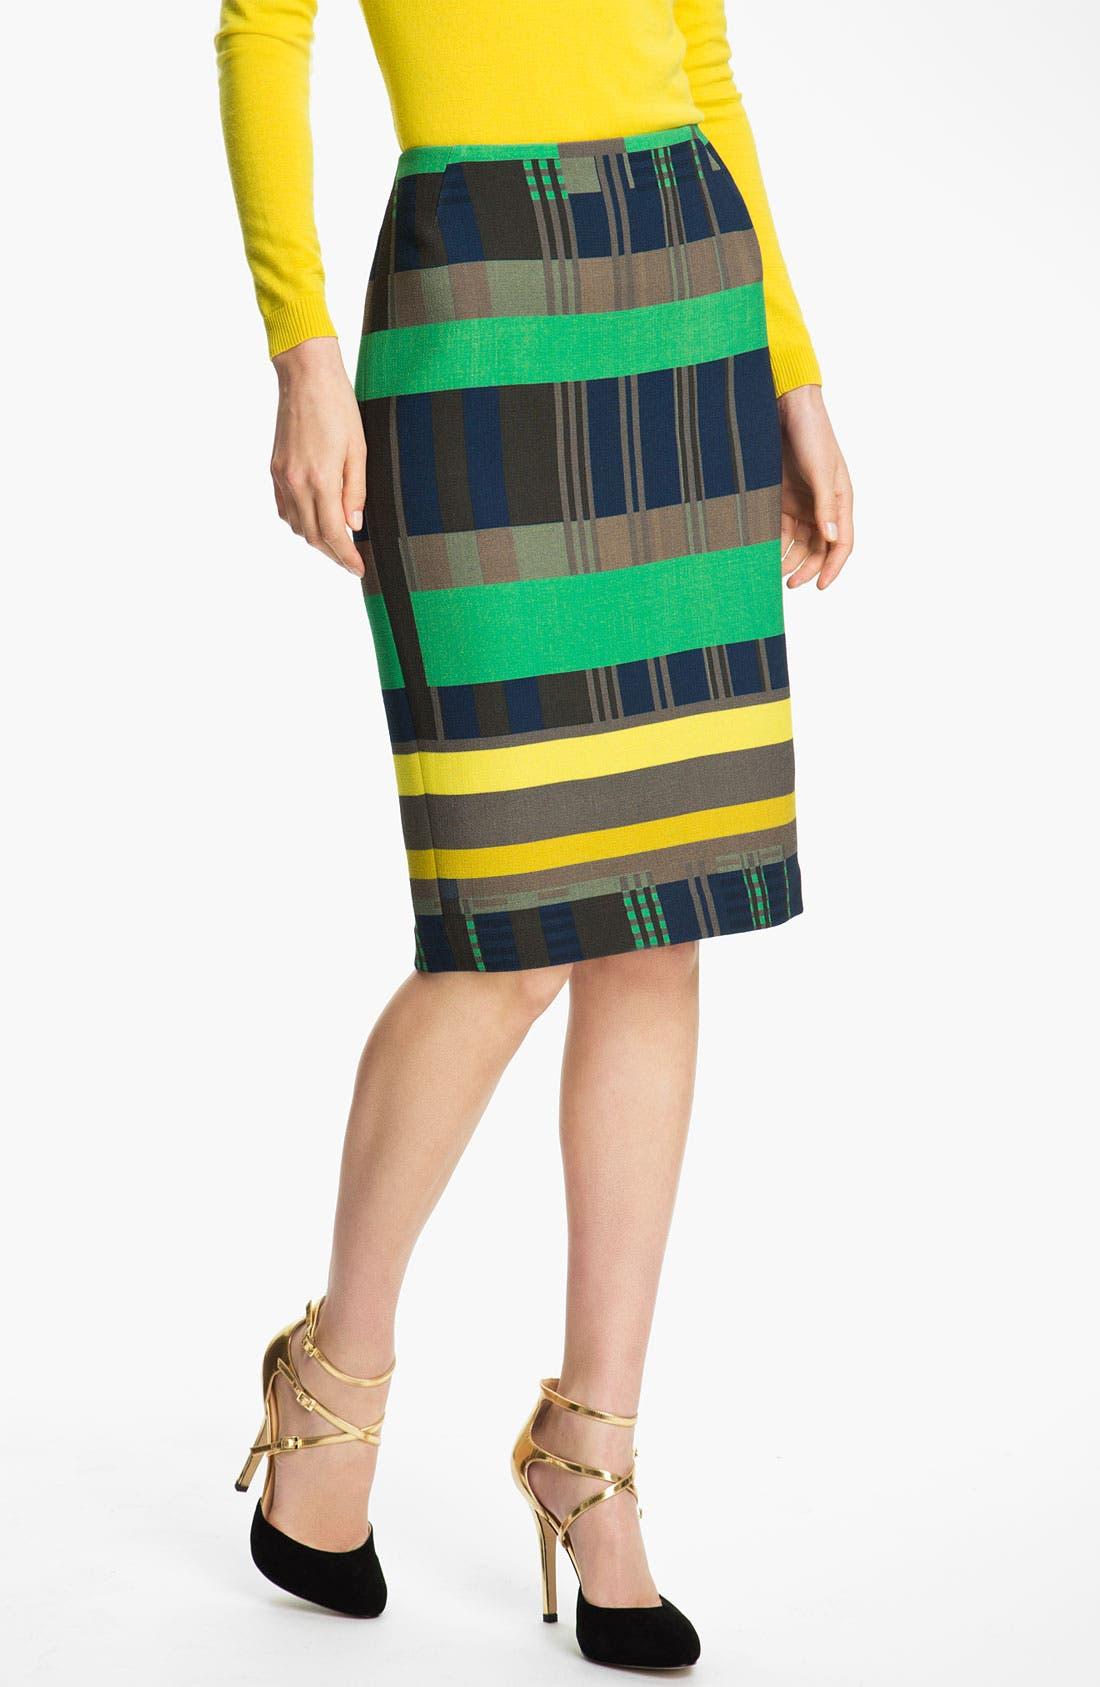 Alternate Image 1 Selected - Lafayette 148 New York Cubism Print Skirt